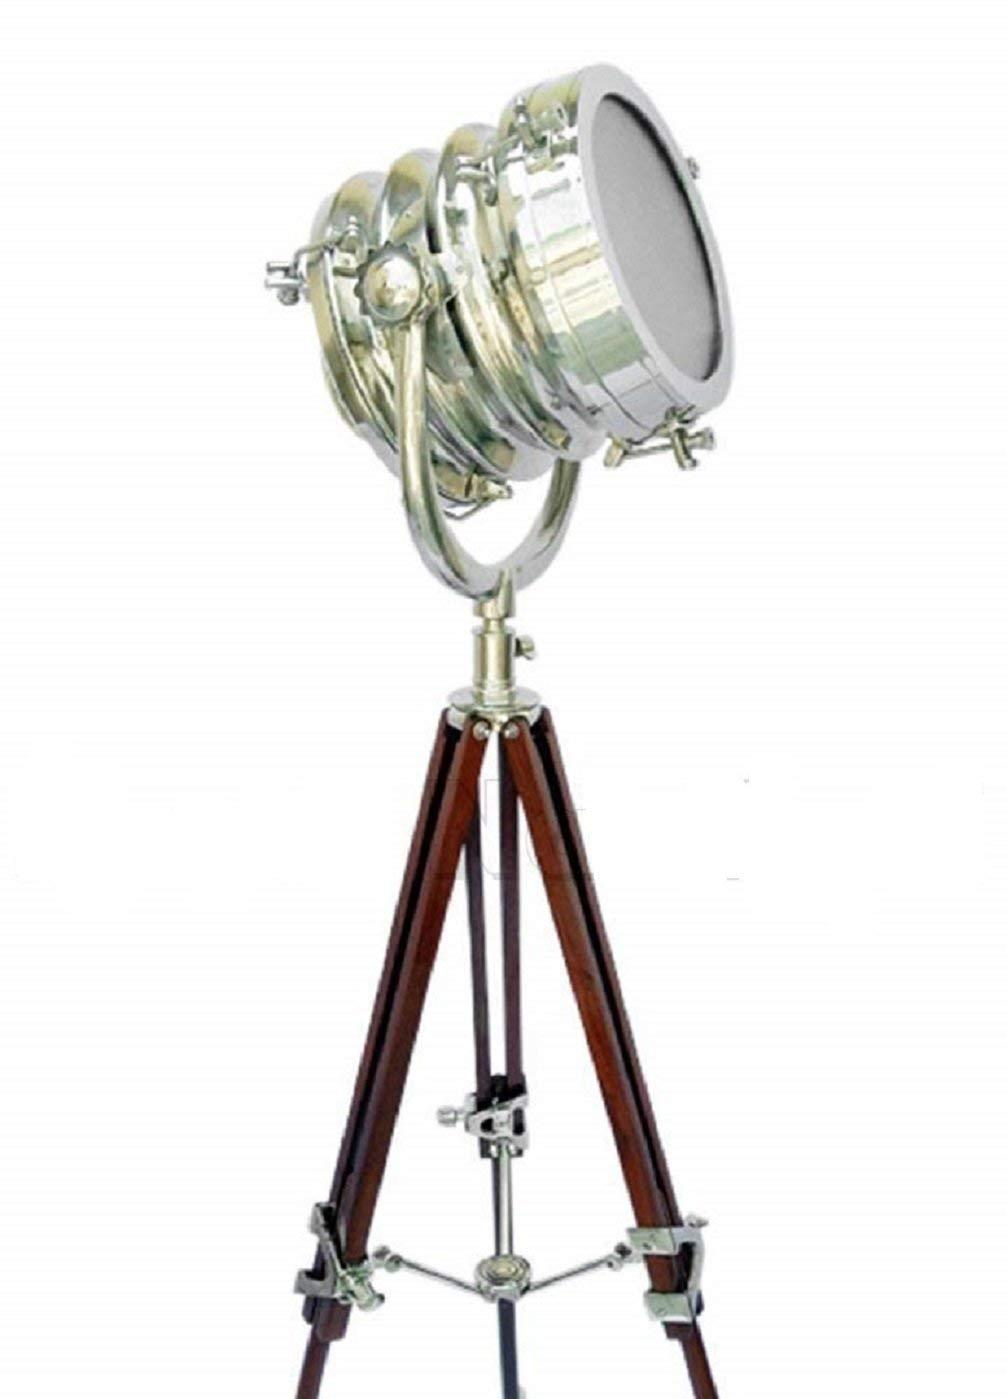 Nautical Electric Lamps Teak Wood Tripod Floor Lamp Stand Home Decor